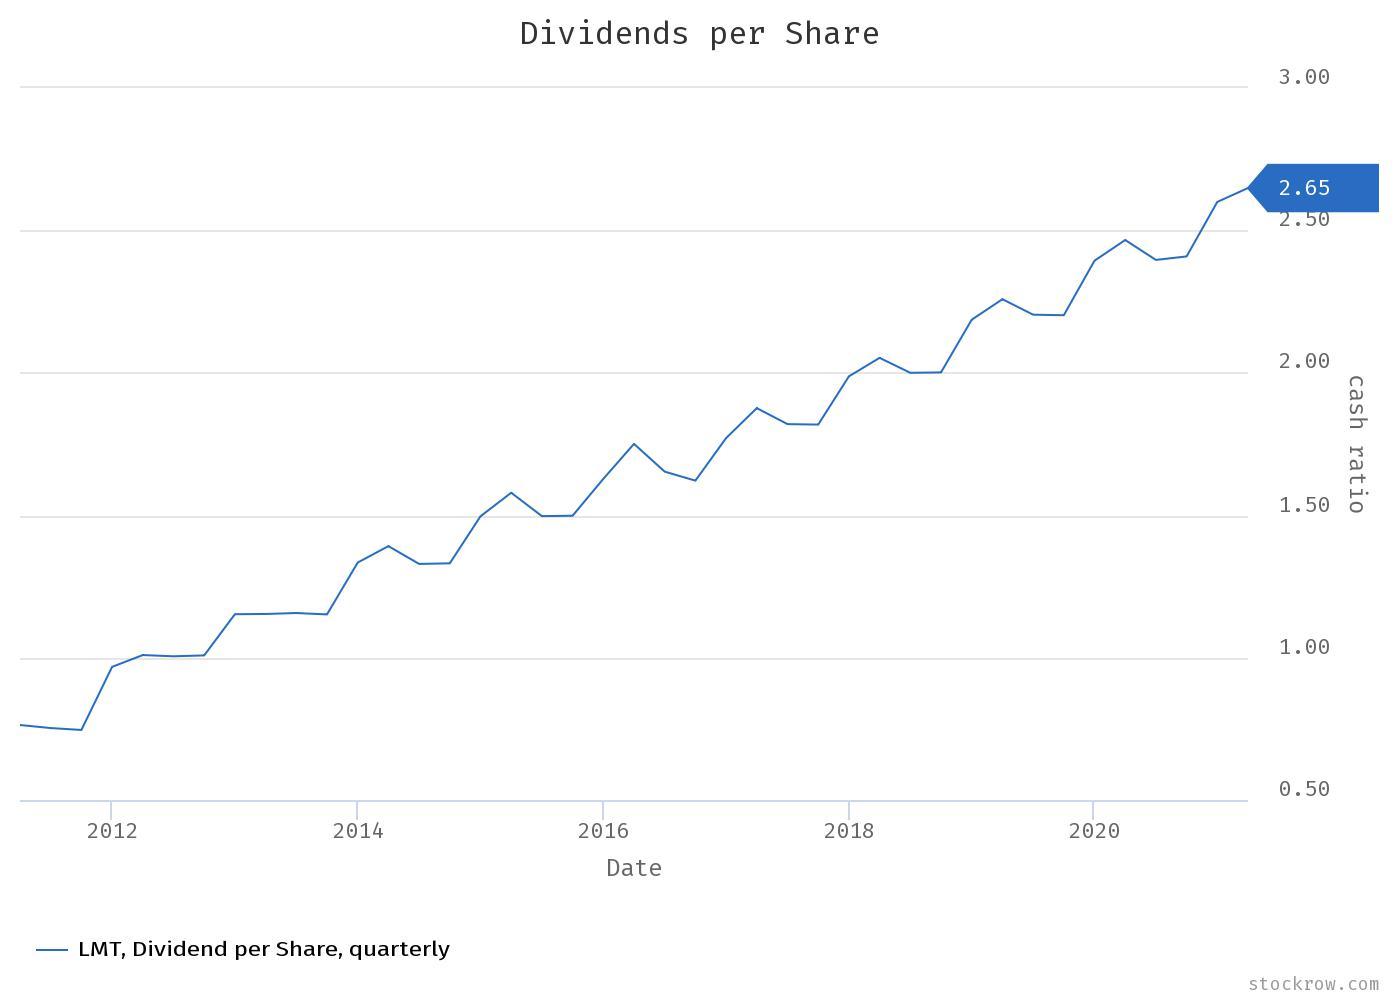 Lockheed Martin Stock Analysis, Dividends Per Share Chart